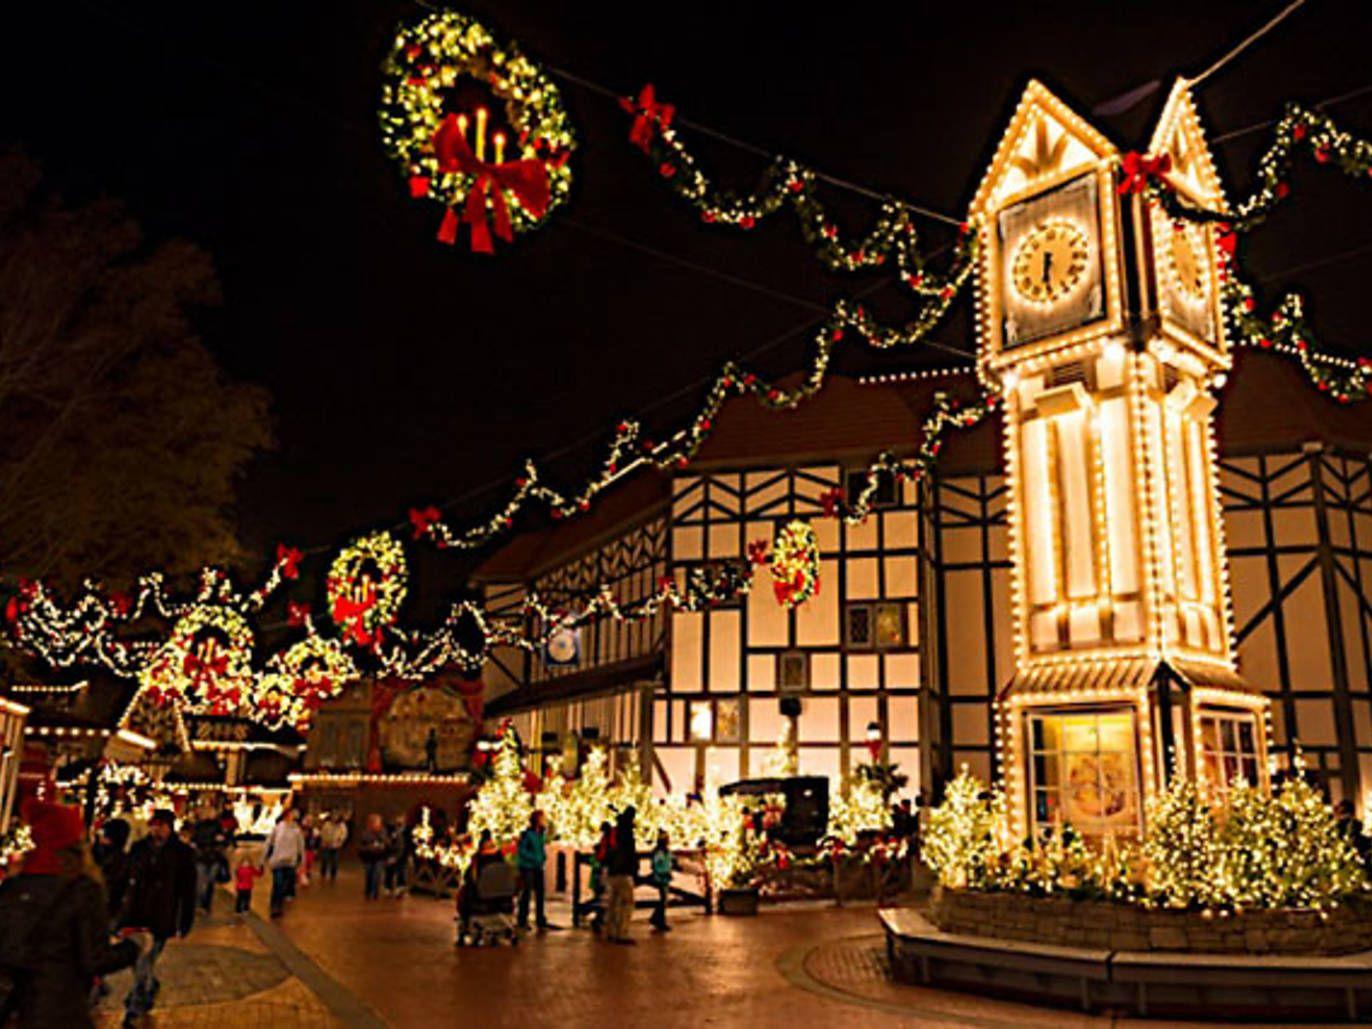 635afd16b30a0e0e065cc3e51d987371 - Tripadvisor Busch Gardens Williamsburg Christmas Town